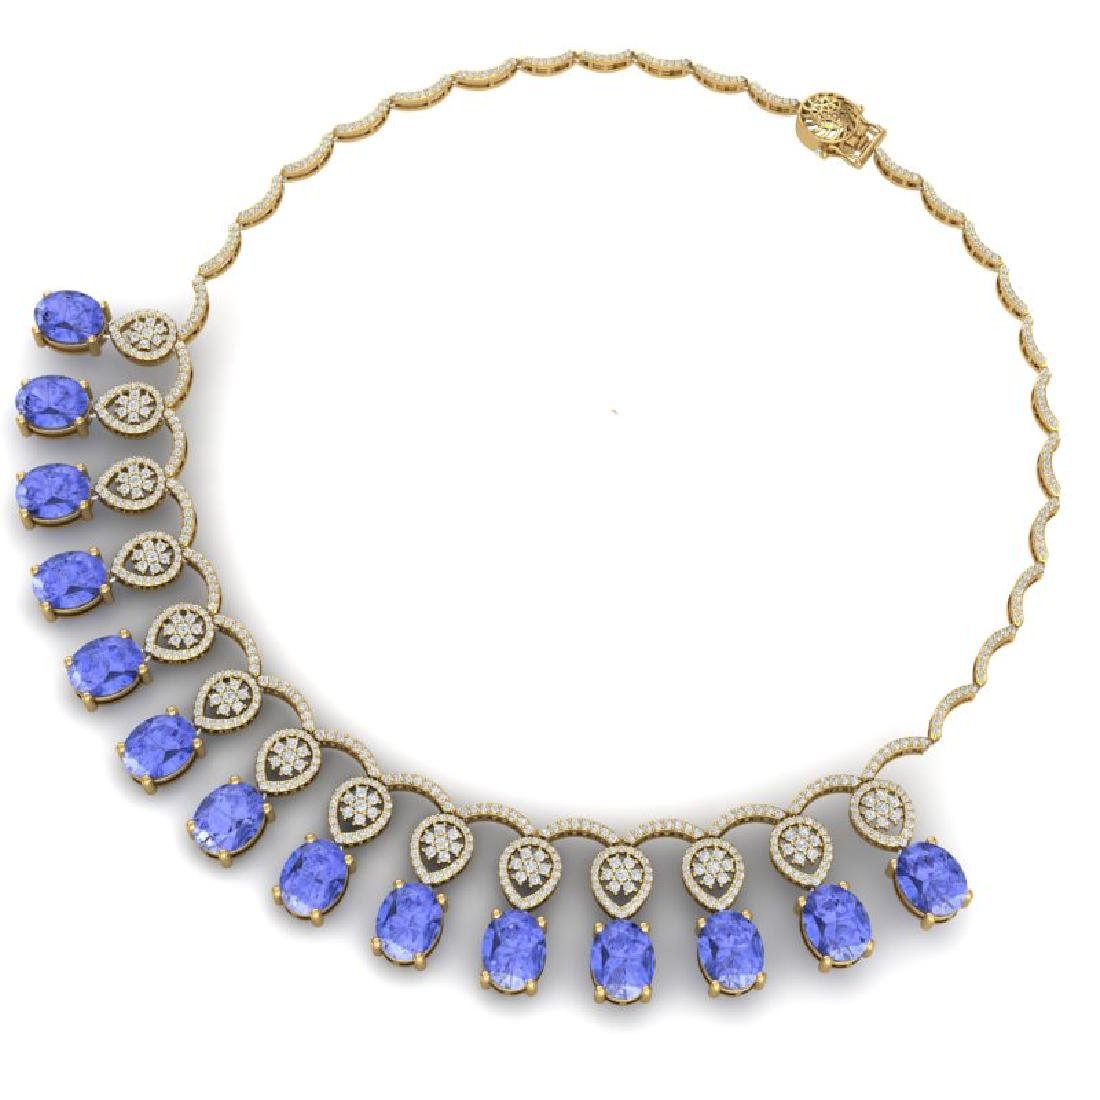 45.56 CTW Royalty Tanzanite & VS Diamond Necklace 18K - 3